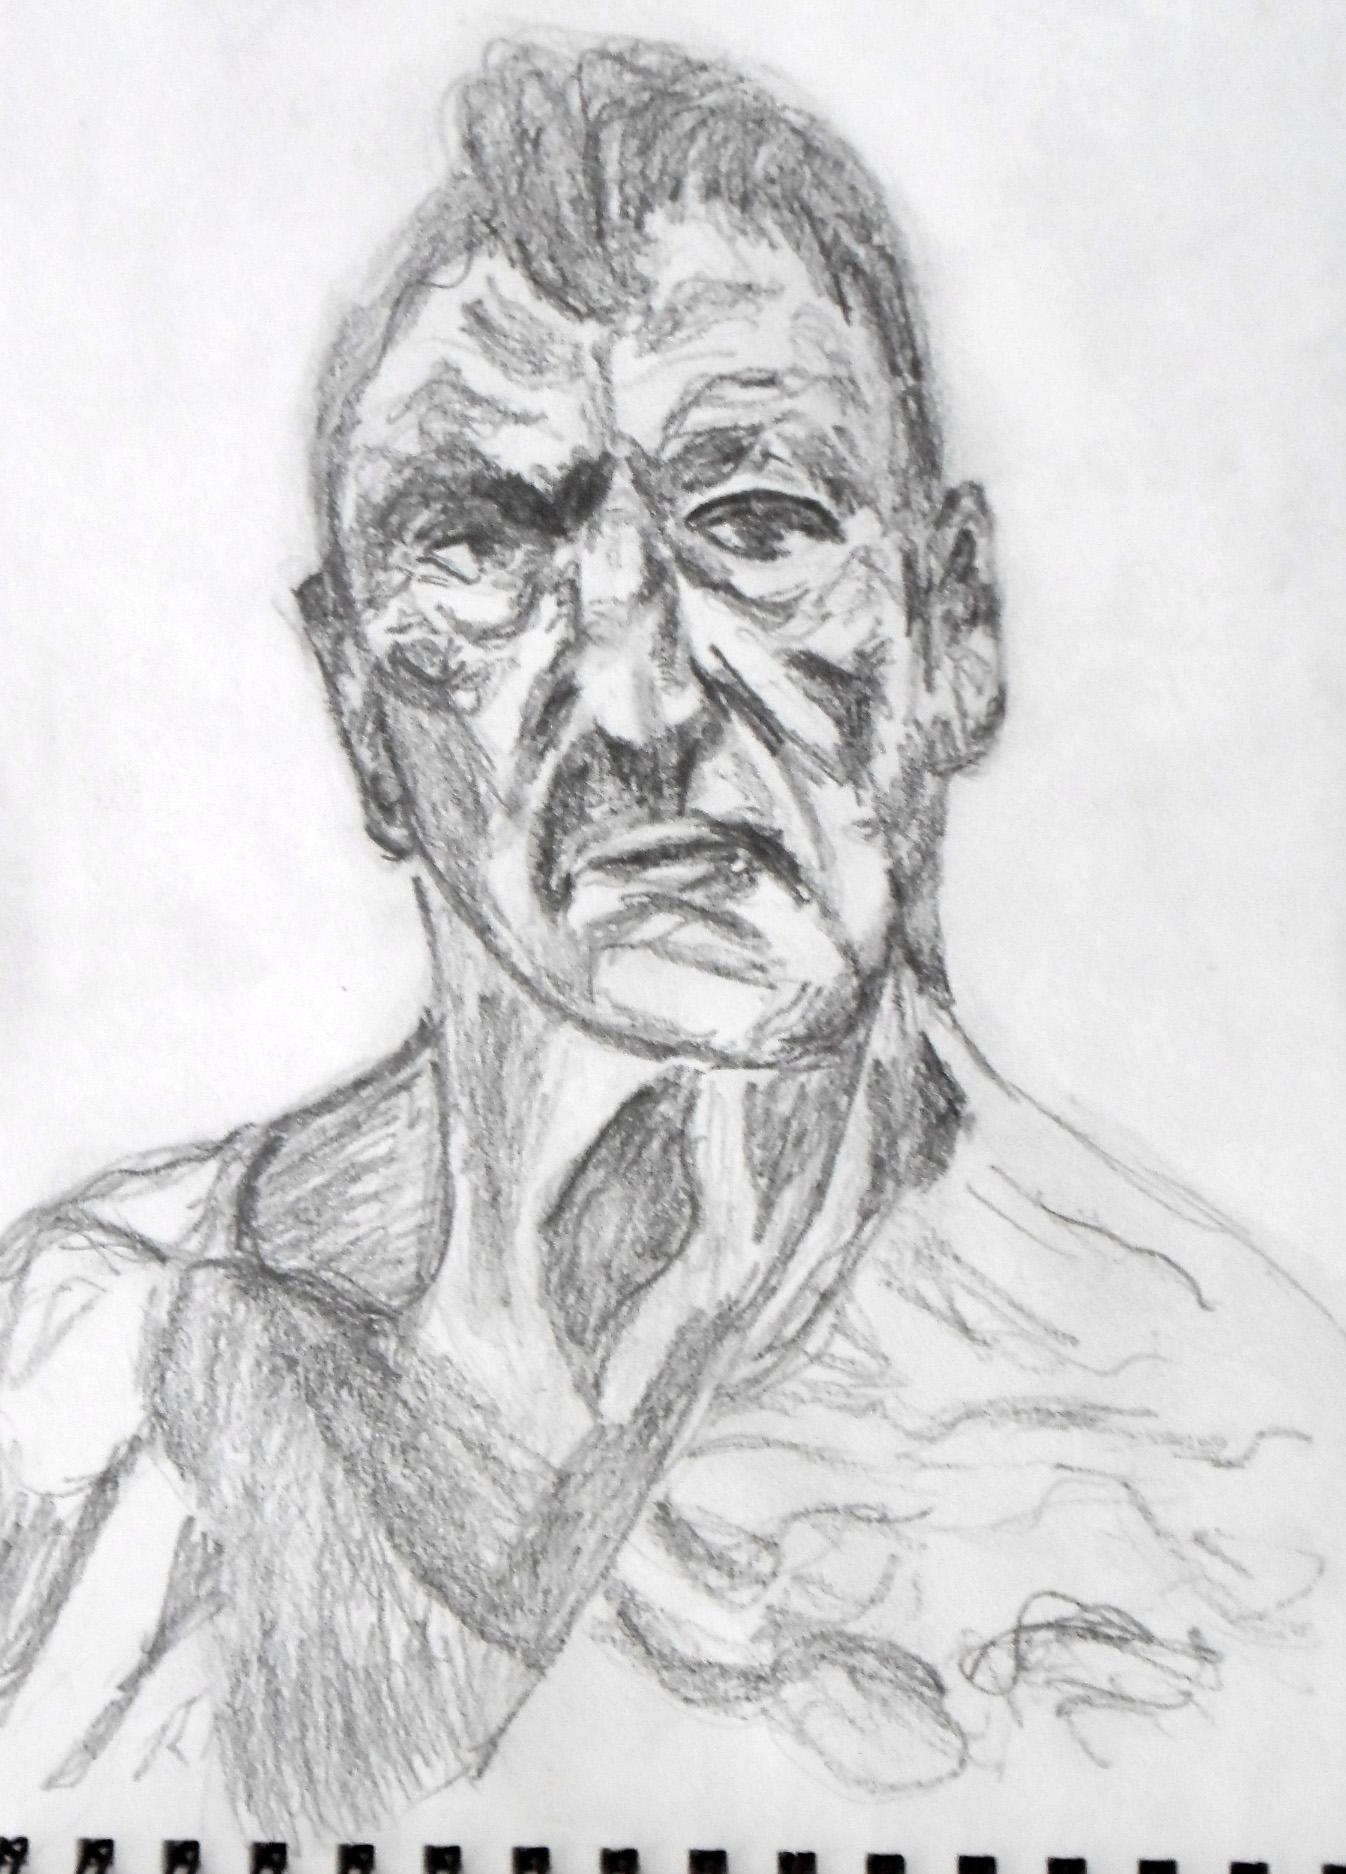 Drawn portrait lucian freud Studio Stories drawing his pencil